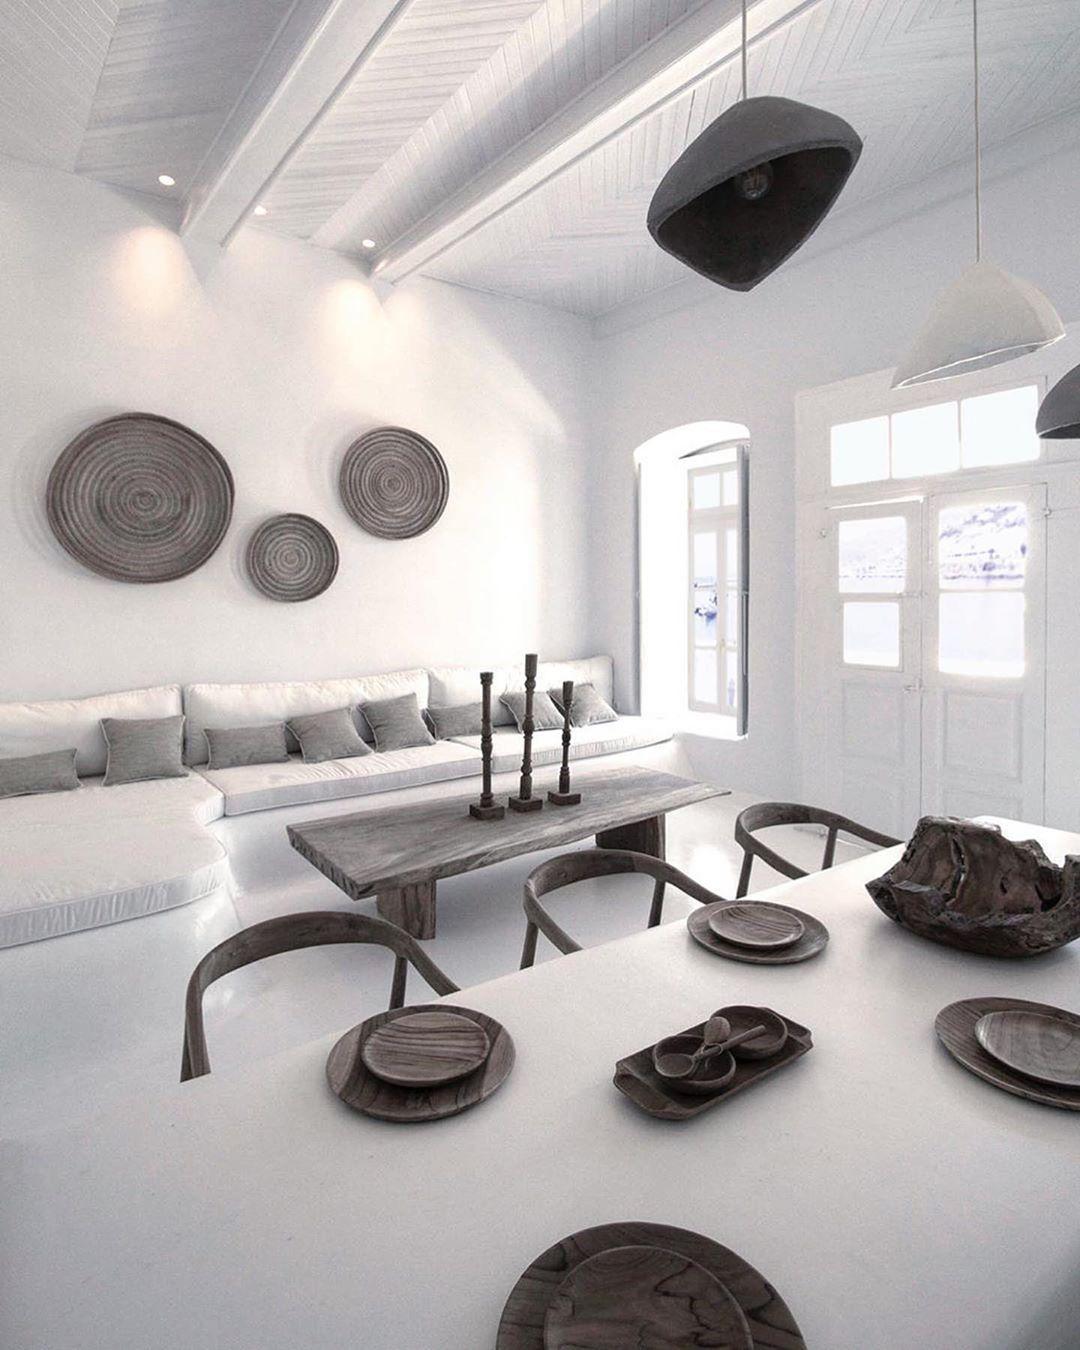 Incredible 20 Best Furniture Consignment Stores Top Interior Design Blogs 2017 Mobilya Spiderweb Homerede Home Decor Home Decor Online Best Interior Design